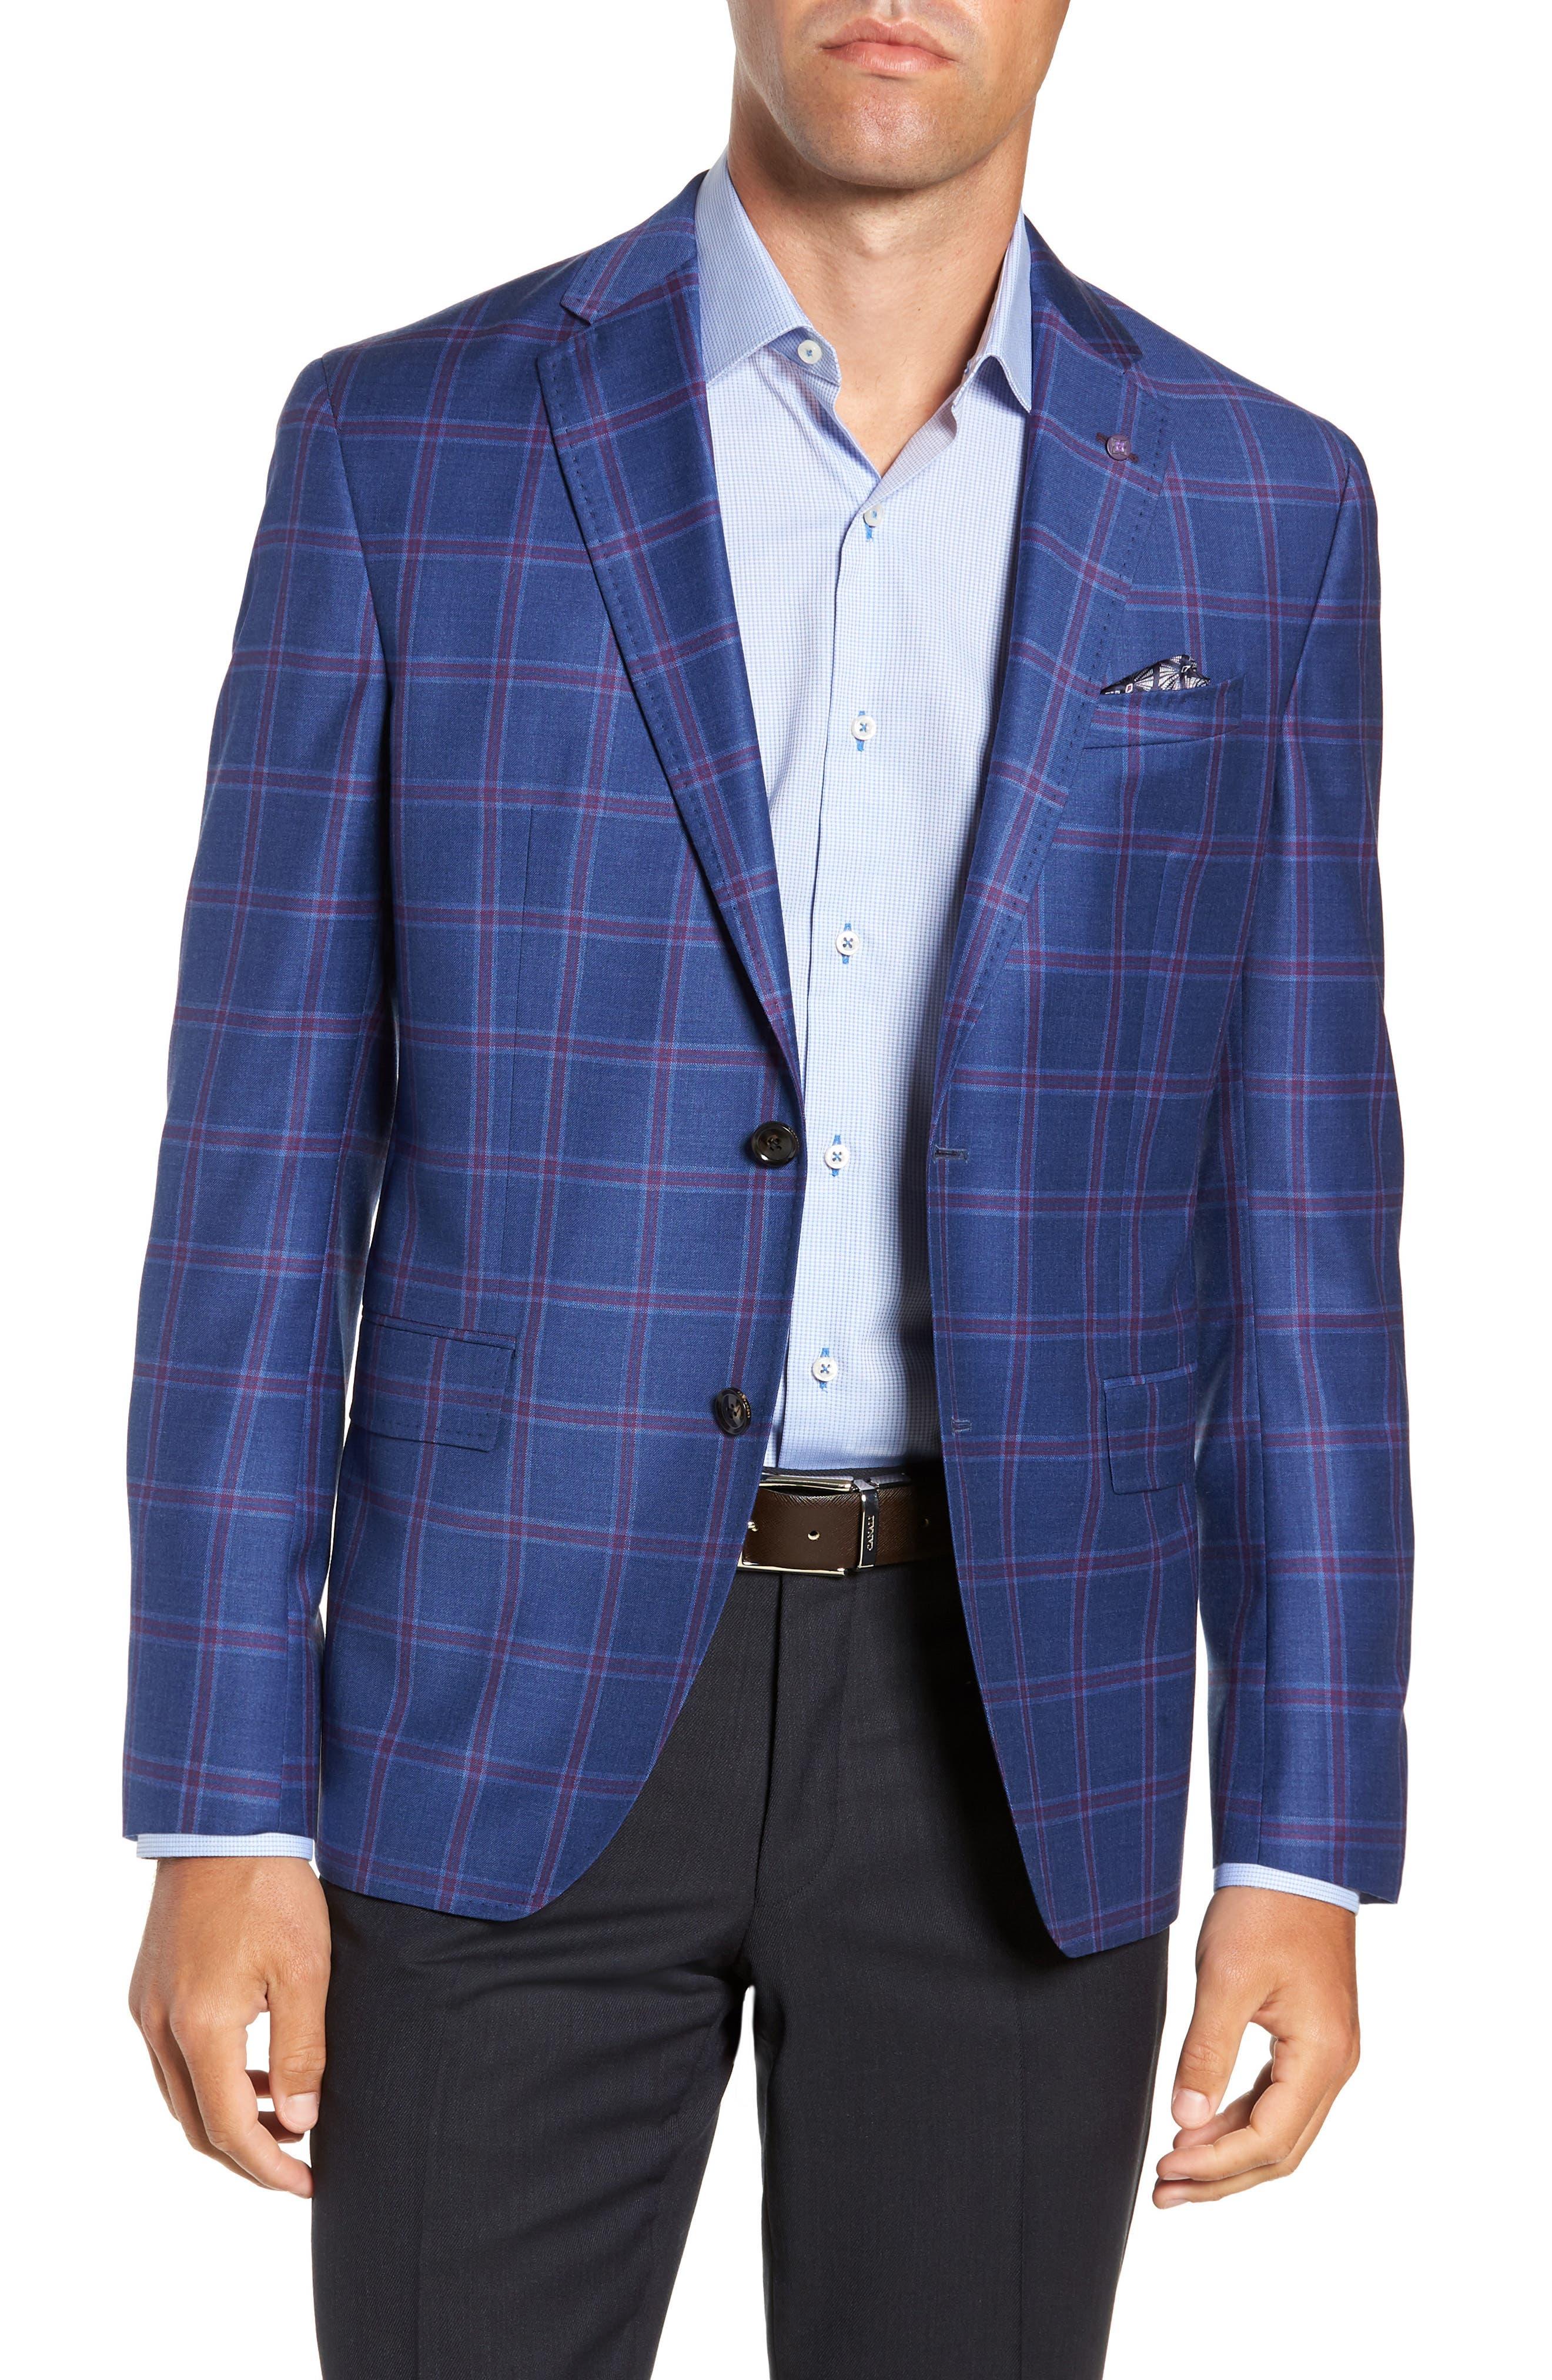 Konan Trim Fit Wool Sport Coat,                             Main thumbnail 1, color,                             BLUE